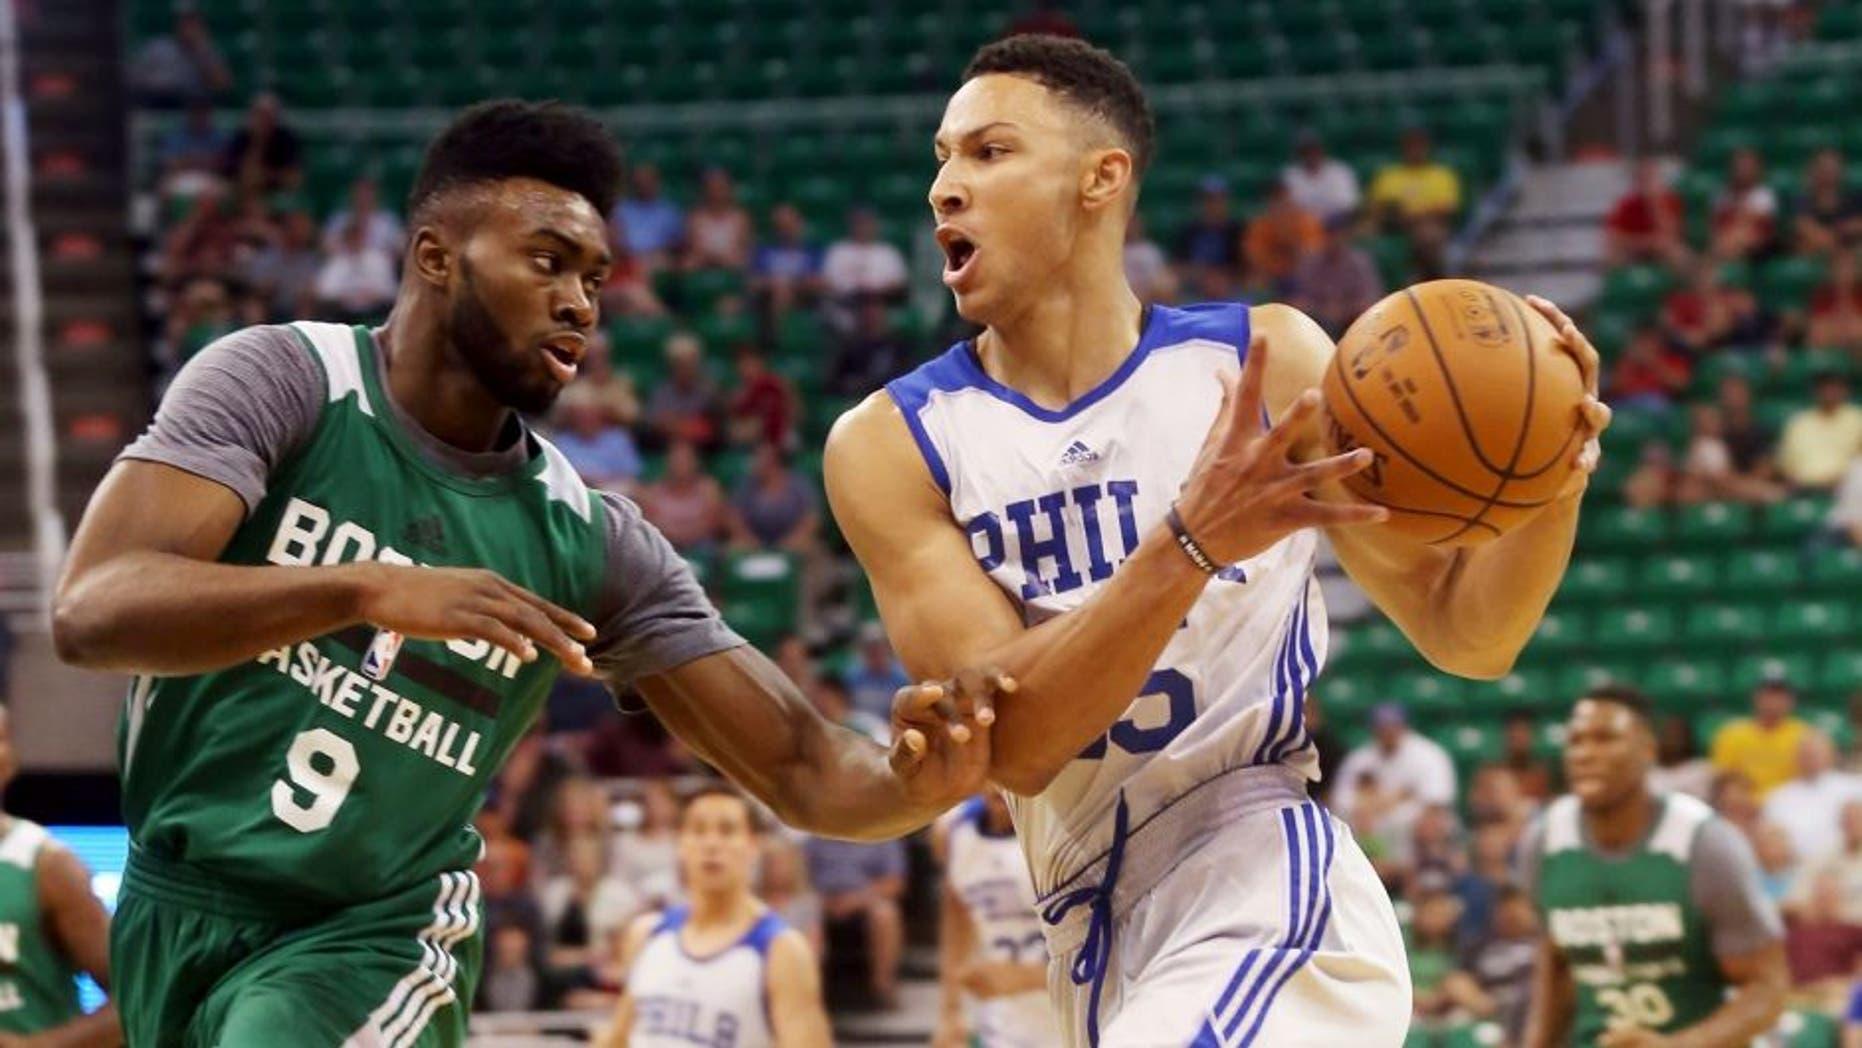 Philadelphia 76ers' Ben Simmons, right, drives the basket past Boston Celtics' Jaylen Brown (9) during an NBA Summer League basketball game Monday, July 4, 2016, in Salt Lake City. (AP Photo/Kim Raff)